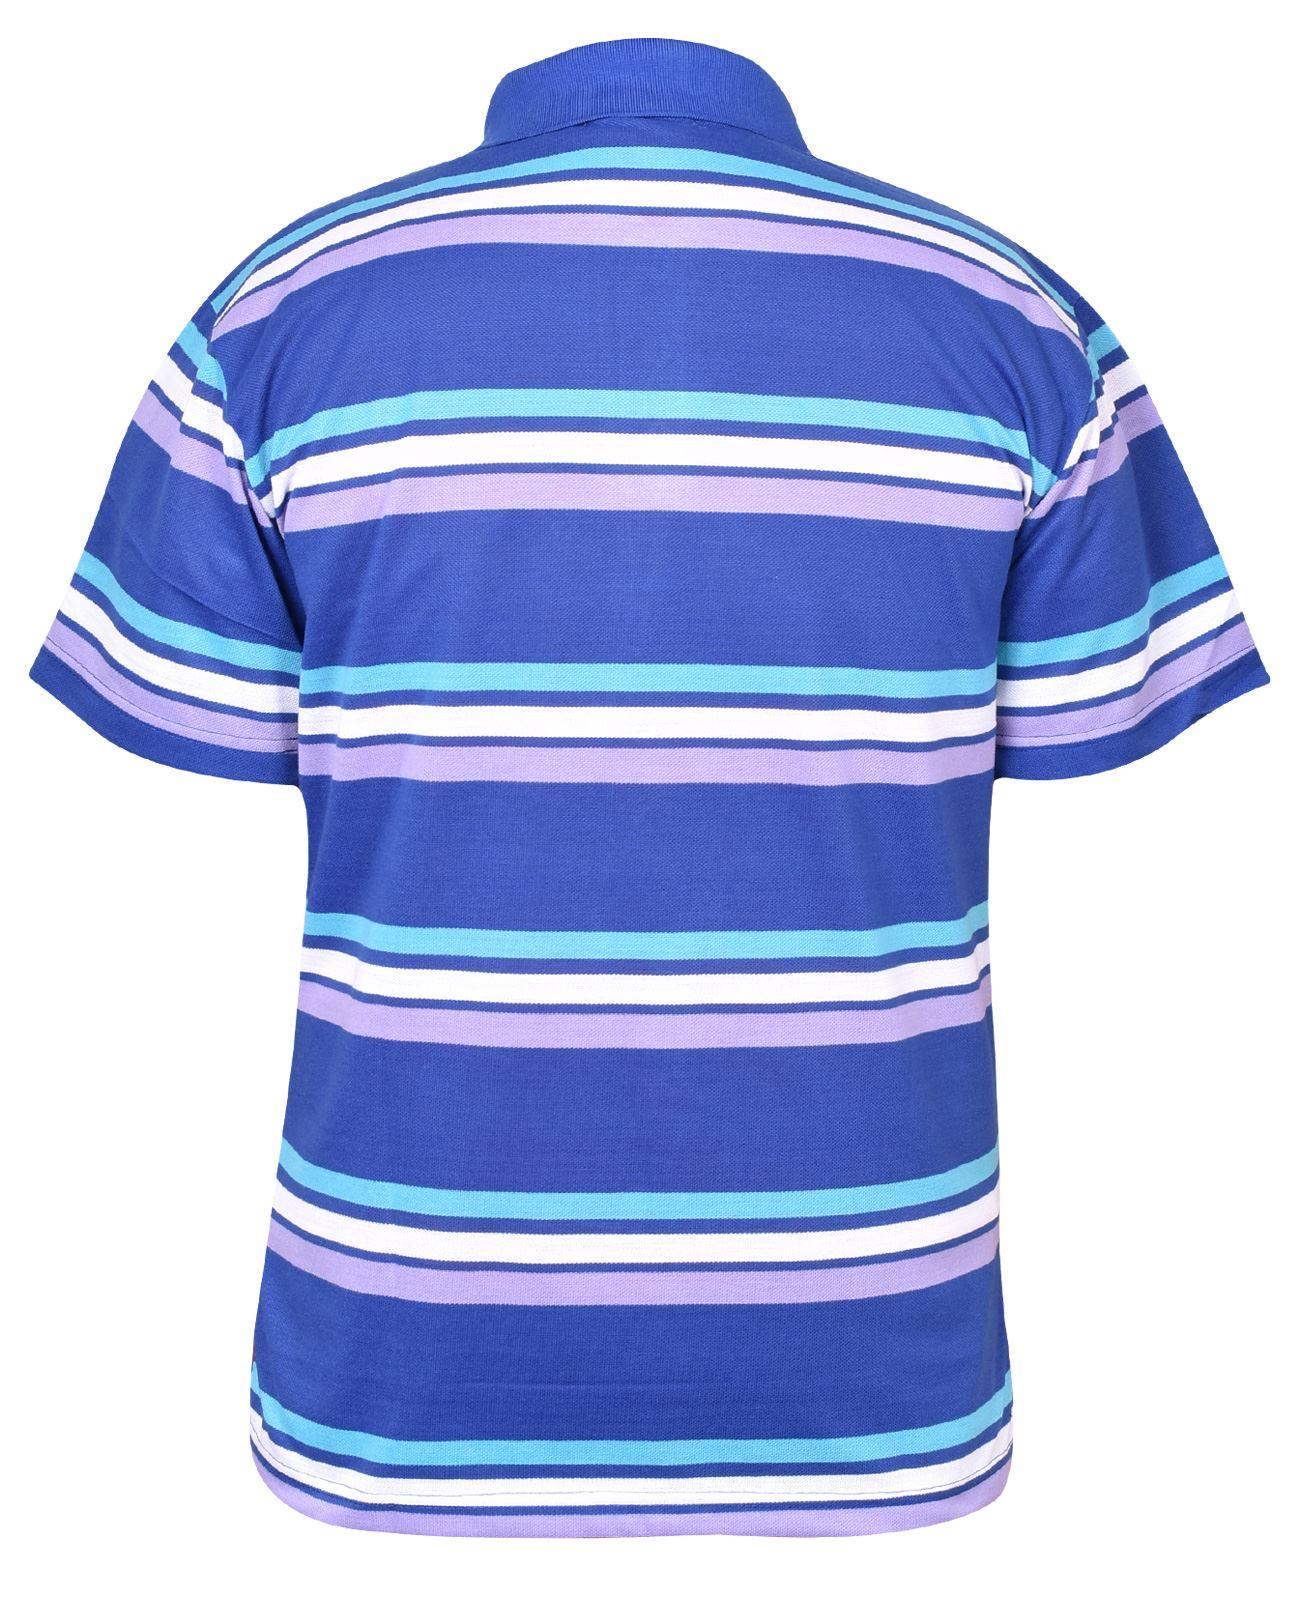 Mens-T-Shirts-Yarn-Dyed-Strip-Pocket-Polo-Shirt-Top-Multi-Colour-Size-M-3XL thumbnail 12